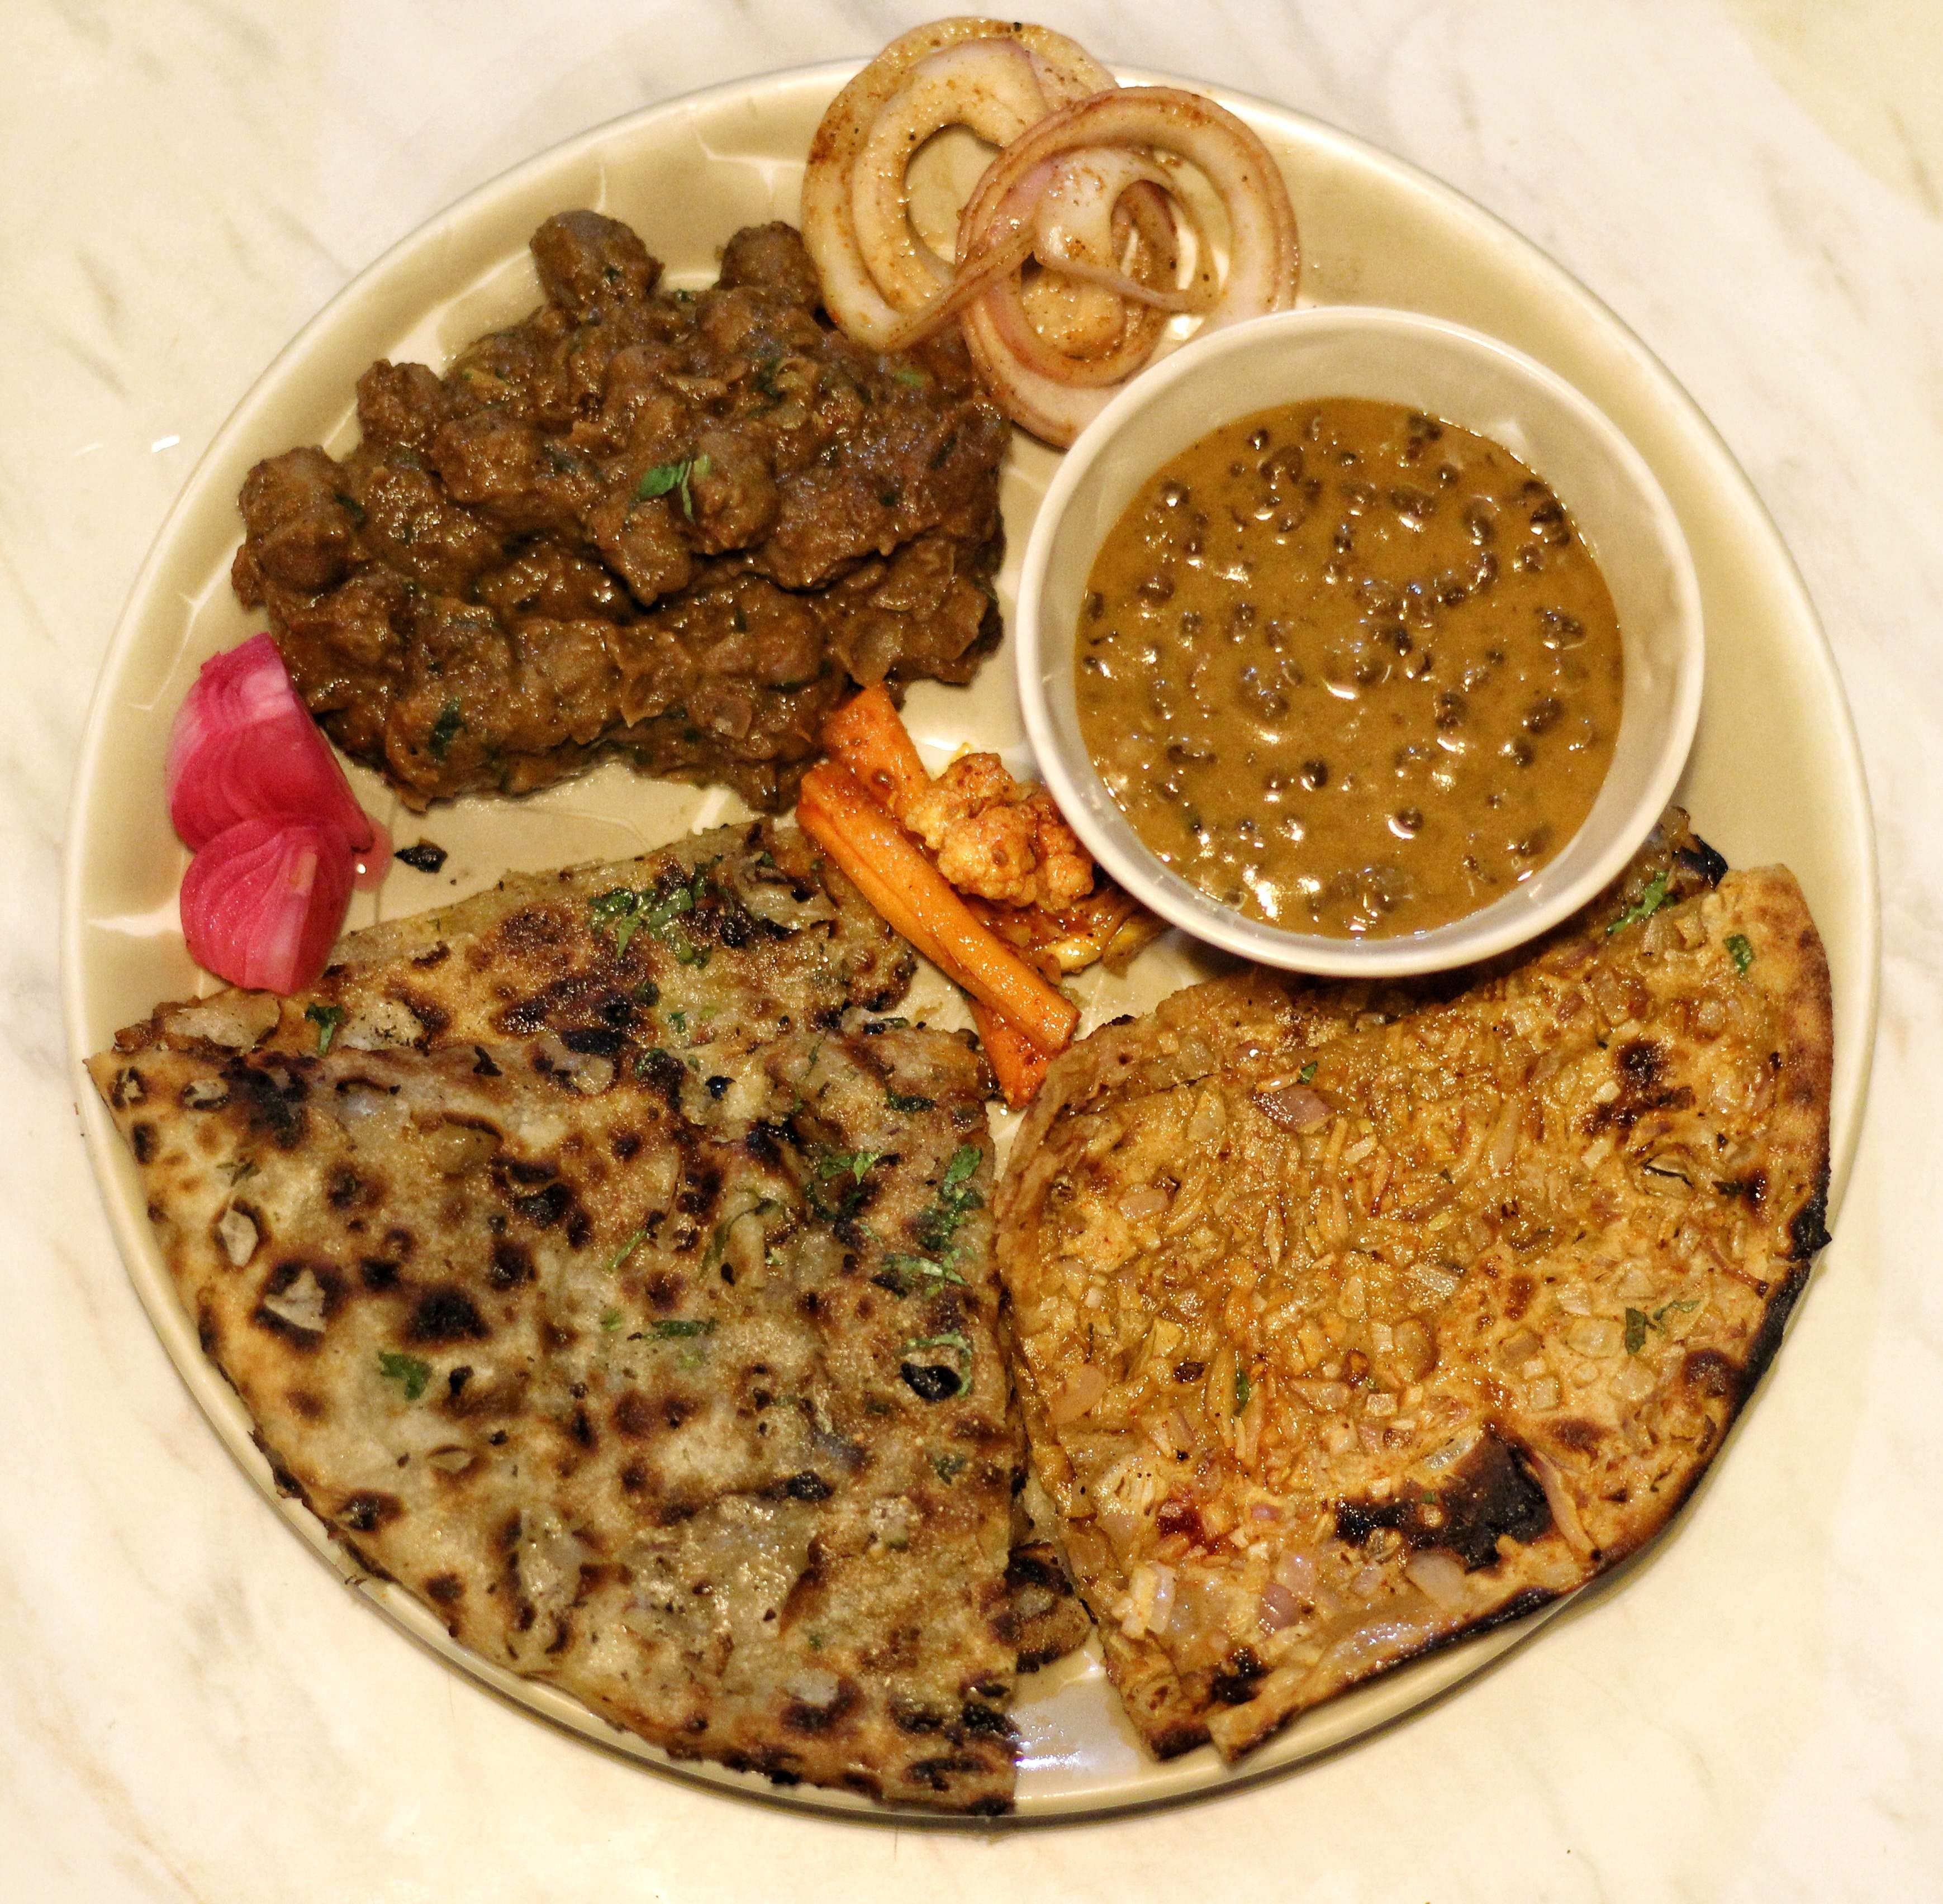 Dish,Food,Cuisine,Ingredient,Roti,Paratha,Produce,Sindhi cuisine,Flatbread,Staple food